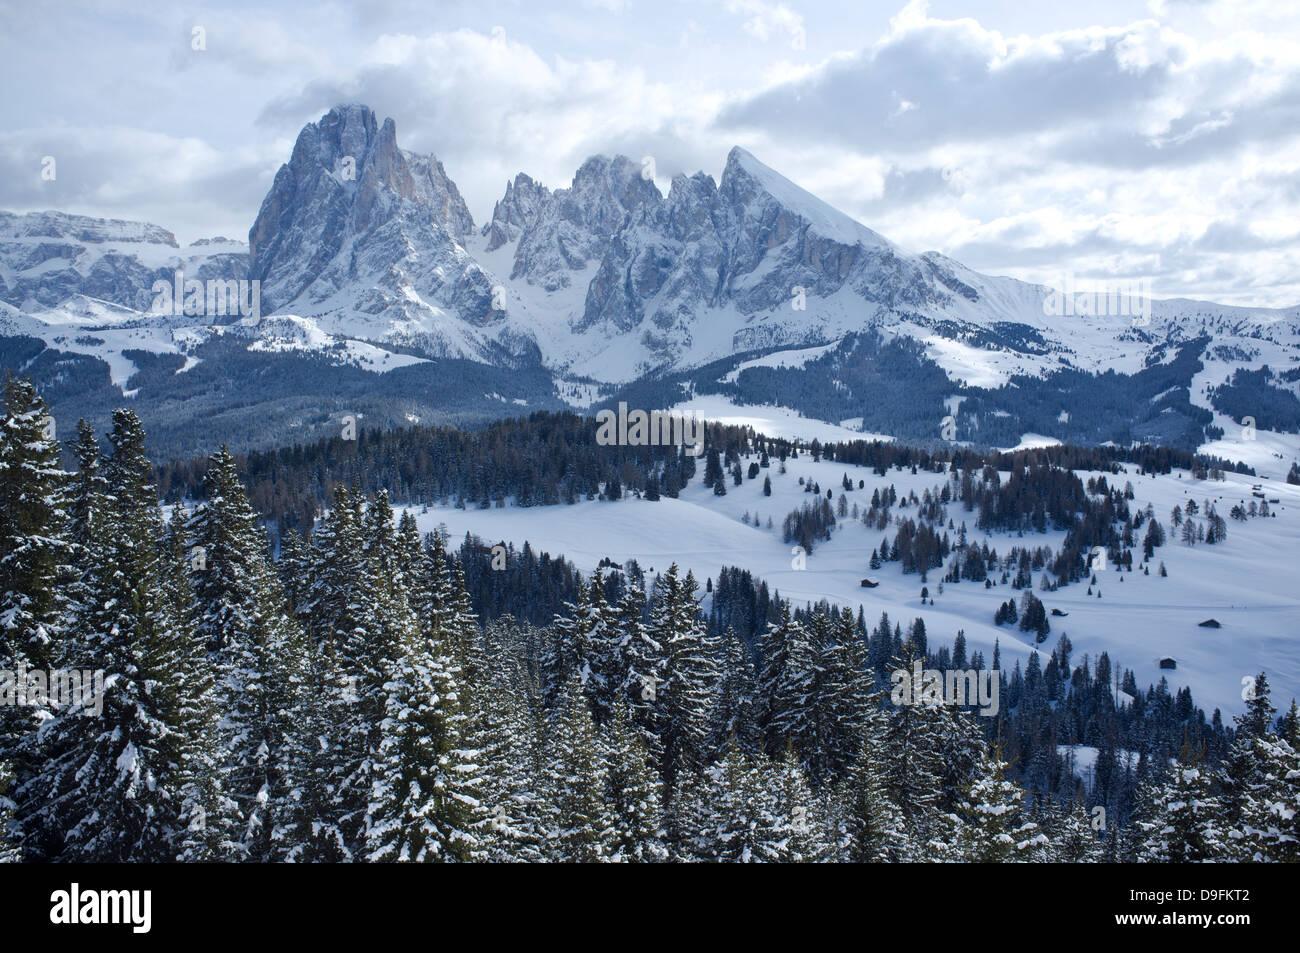 A snowy view of Sassolungo and Sassopiato Mountains behind the Alpe di Siusi ski area in the Dolomites, South Tyrol, - Stock Image